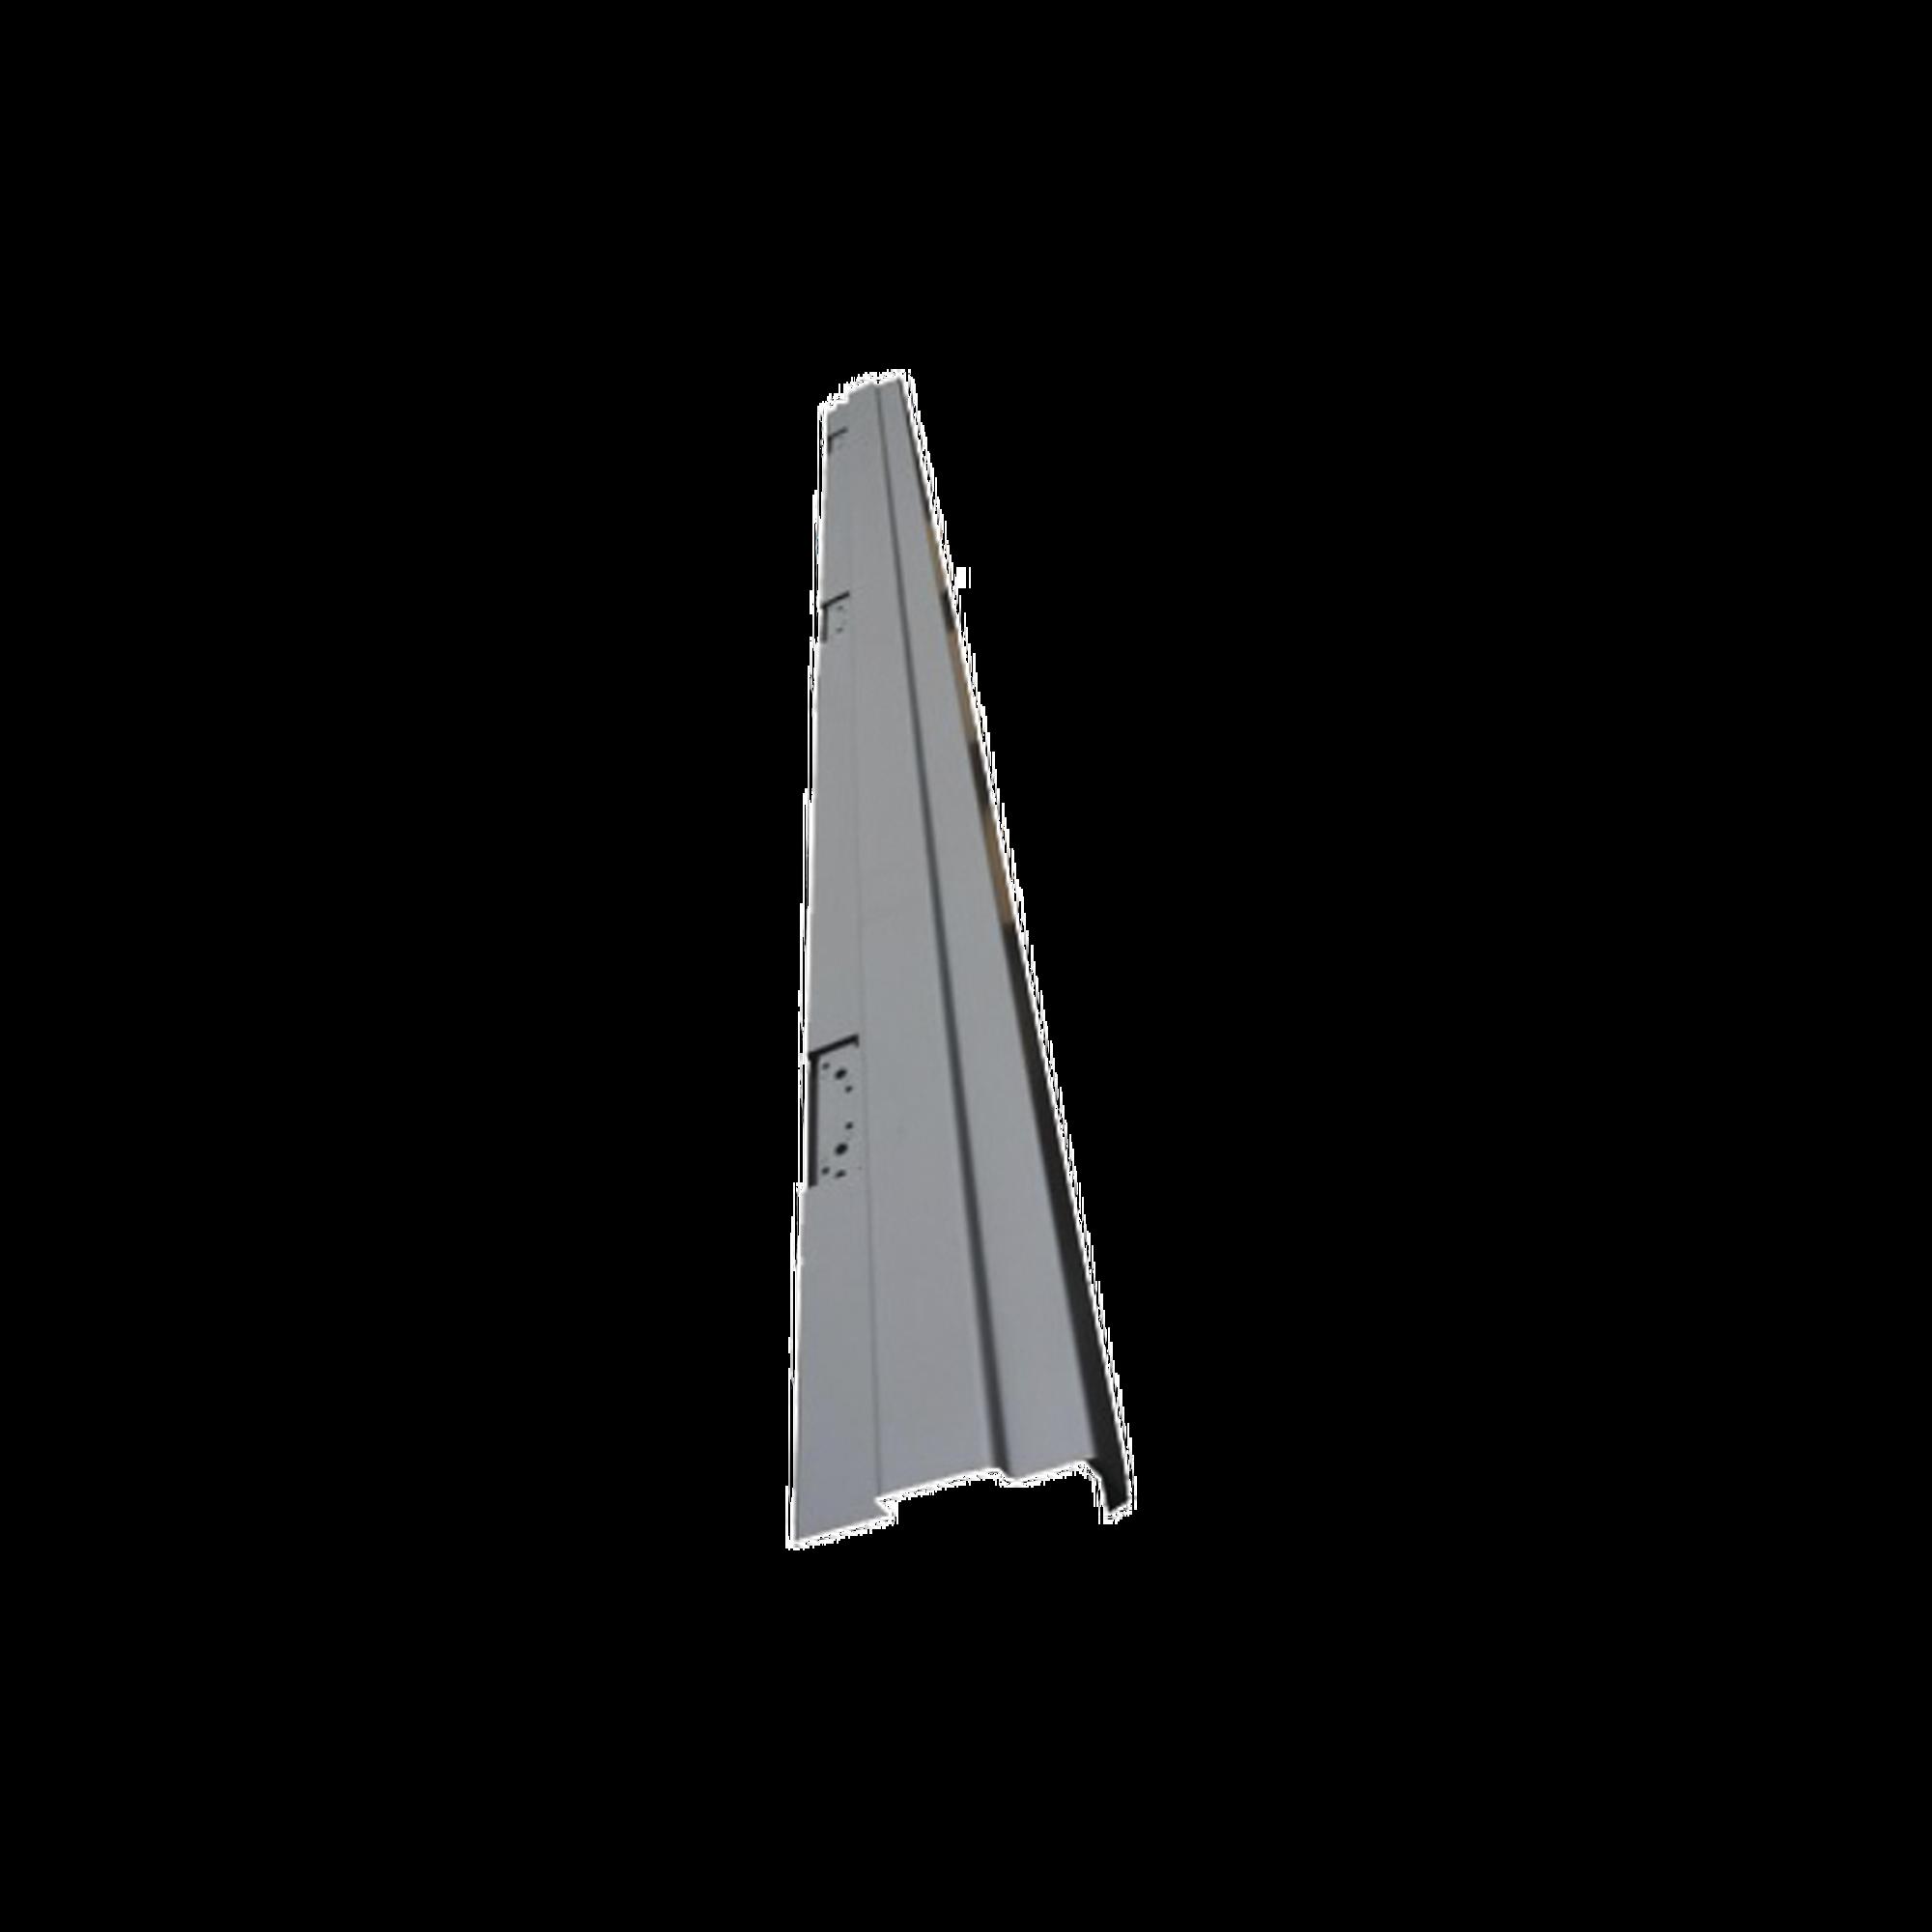 Jamba de bisagras galvanizada,  68, 5 3/4  izquierda